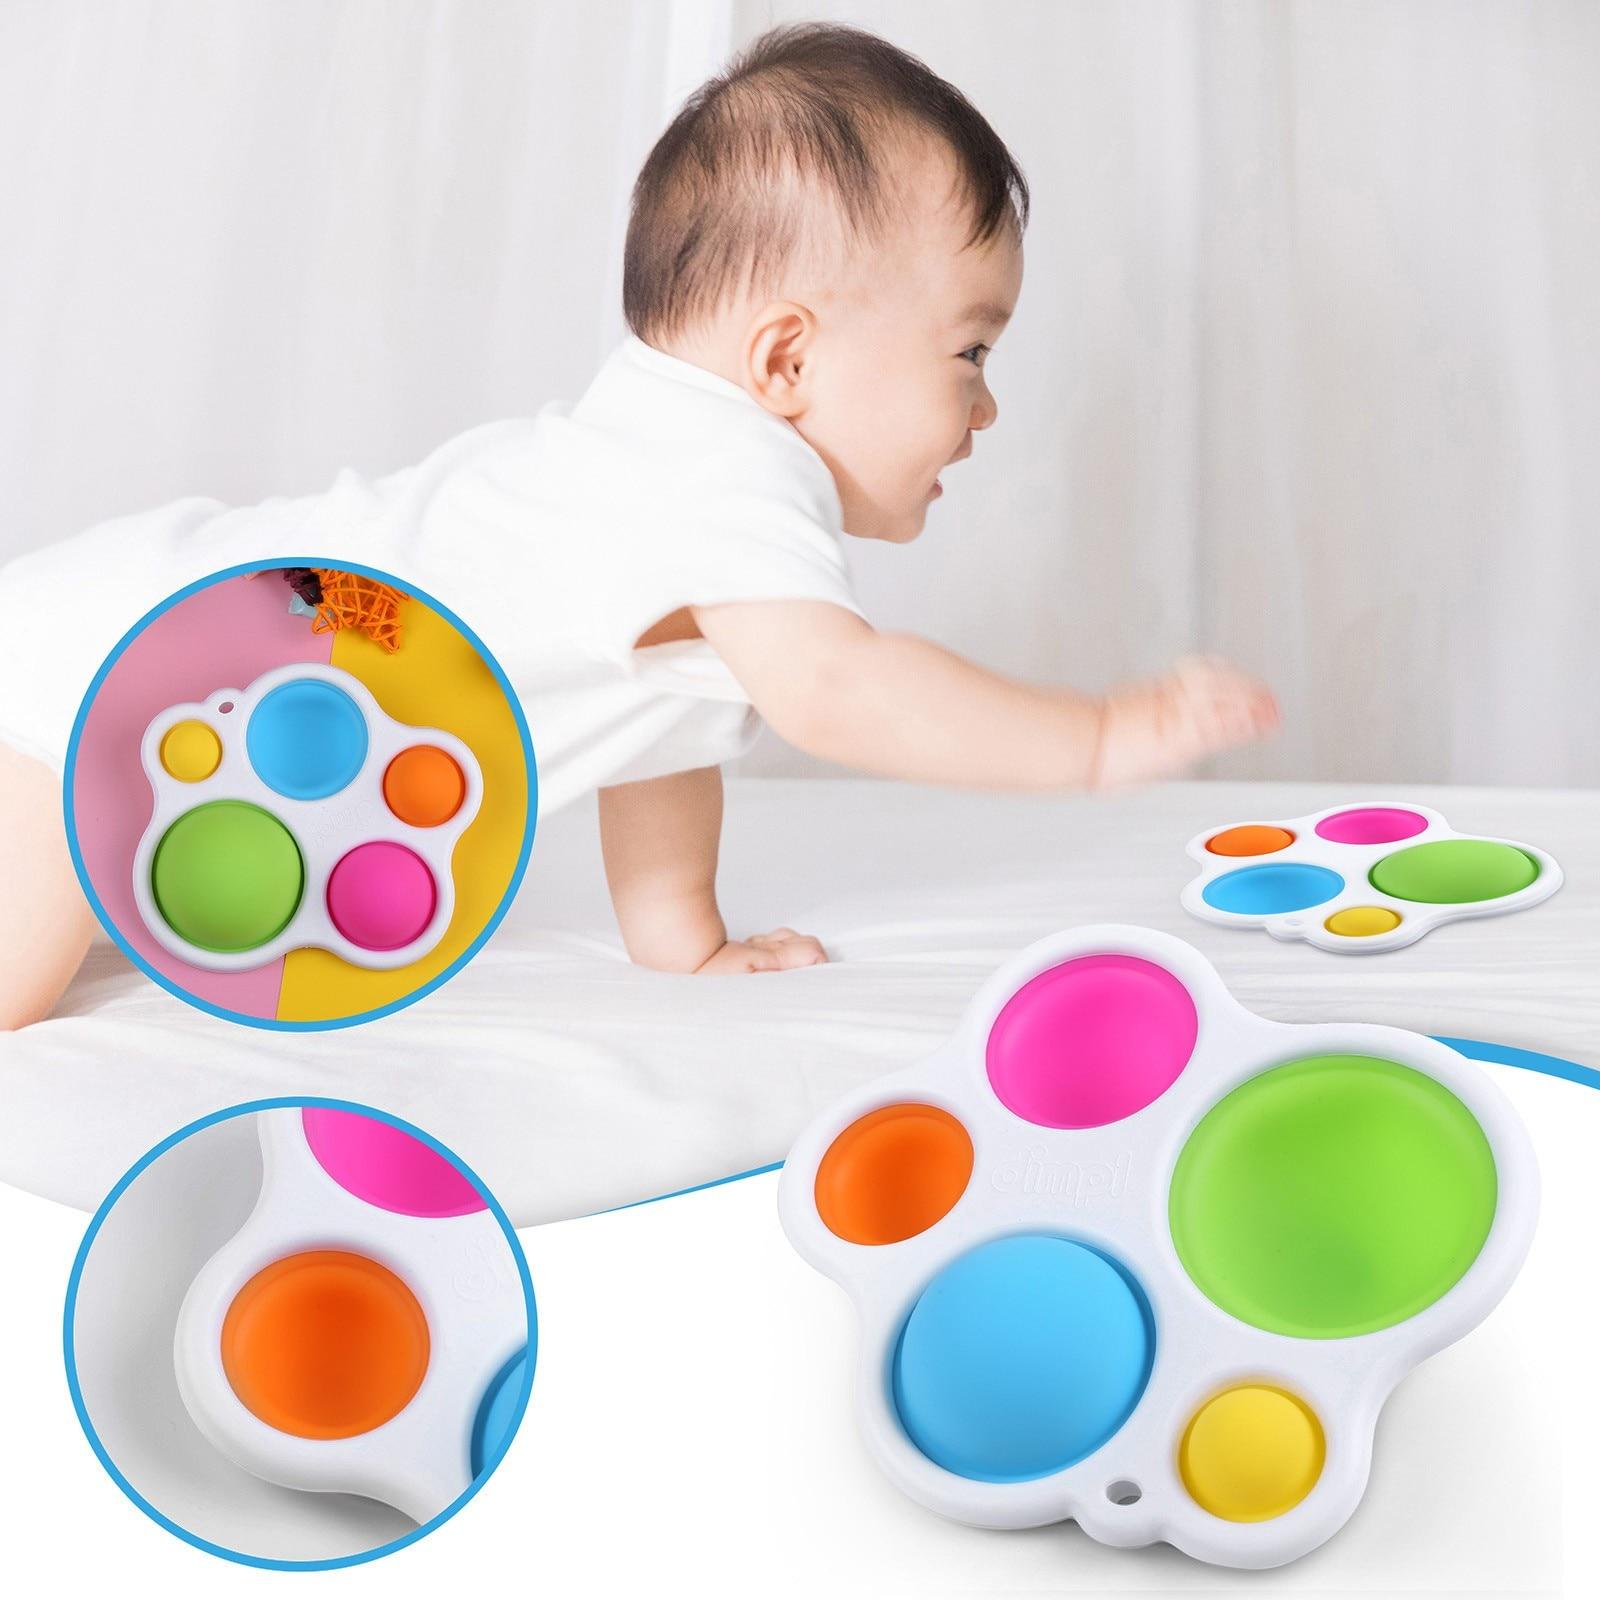 Toy Fidget-Toys Puzzle Baby-Toy Training Simple Dimple It-Sensory Pops Brain-Development-Enlightenment